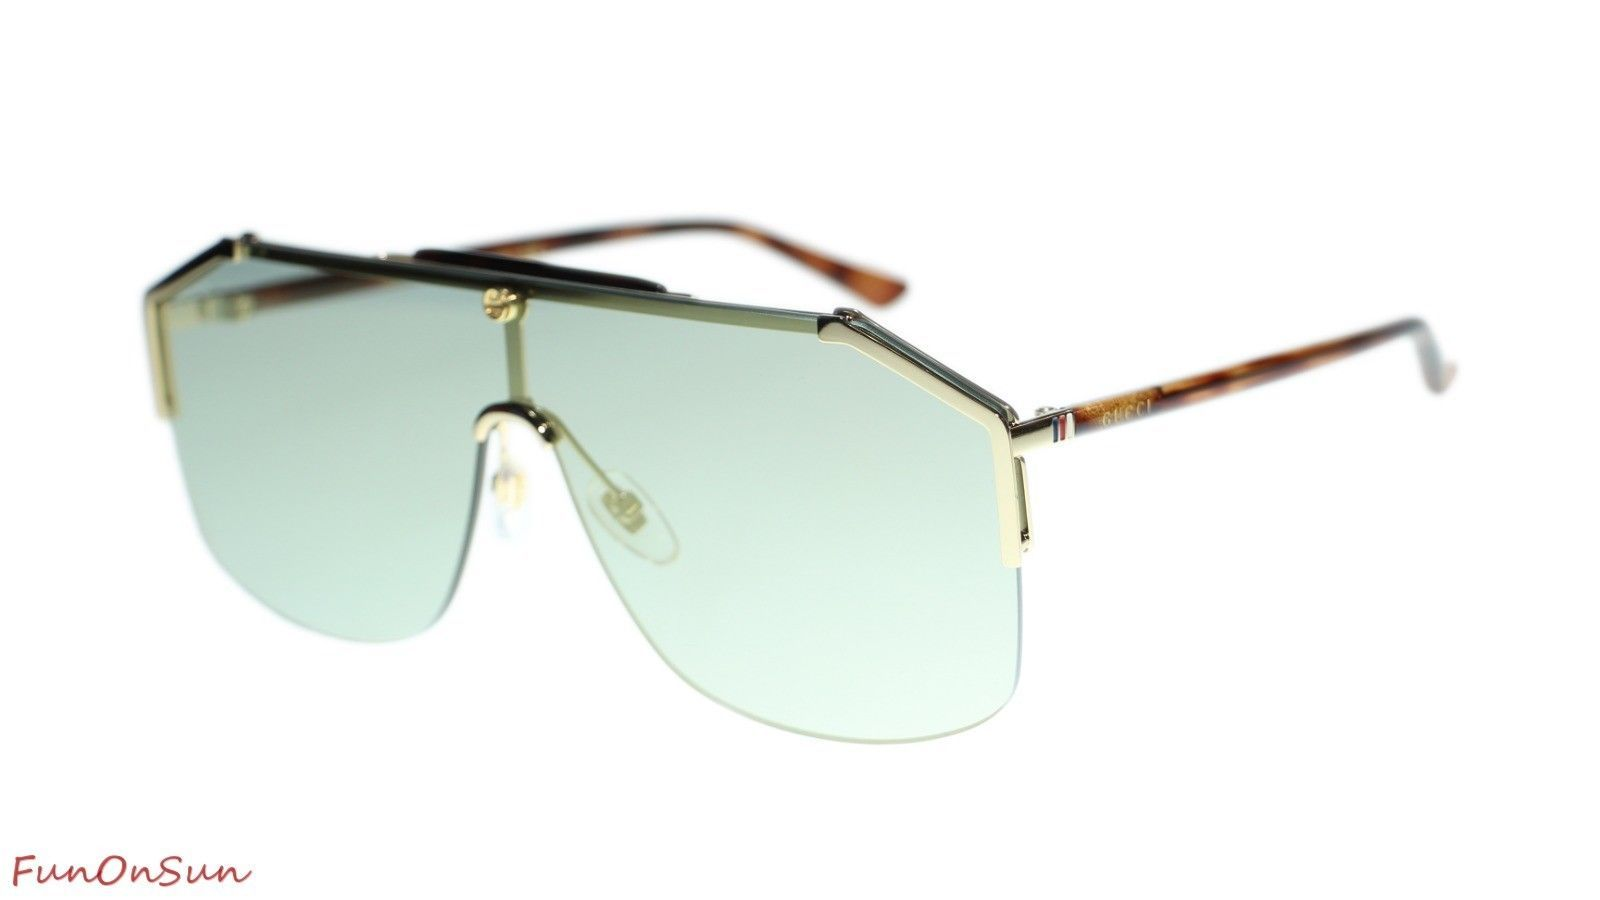 62878fec76 57. 57. Previous. NEW Gucci Sunglasses GG0291S 005 Havana Gold Bronze  Mirror Lens 99mm Authentic